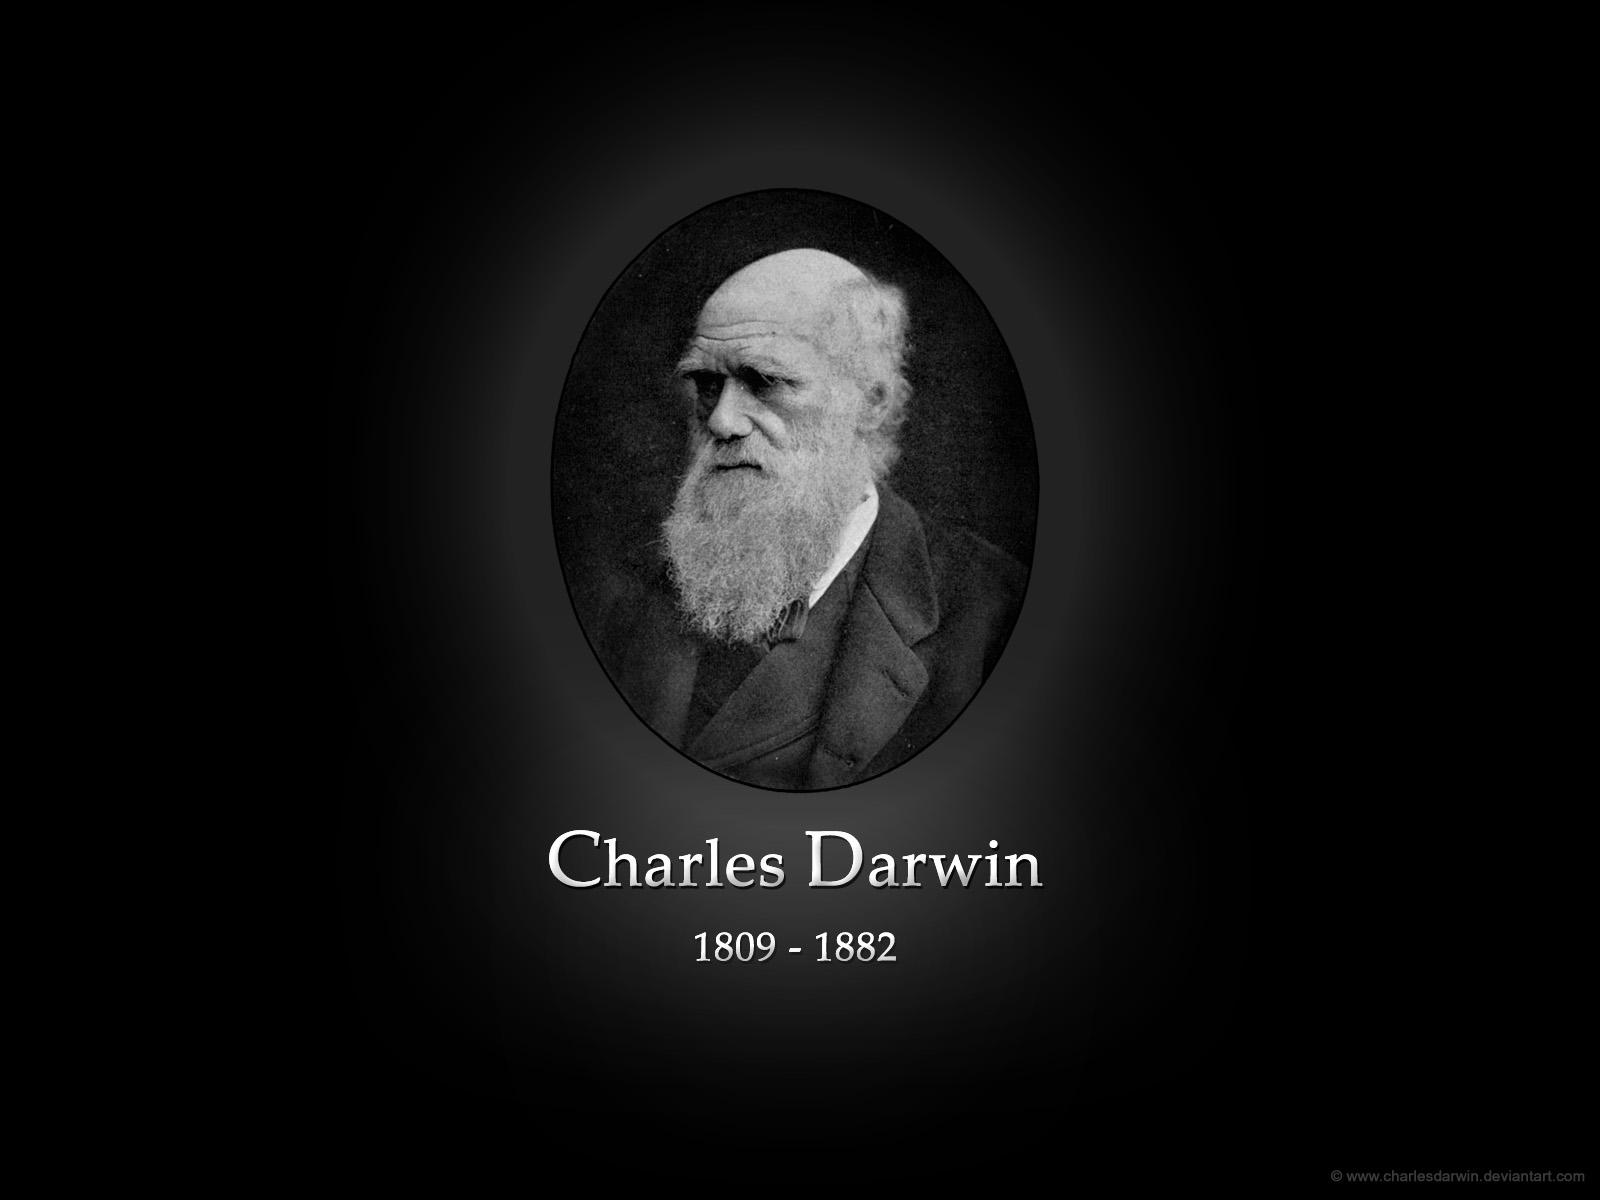 Charles Darwin Wallpaper V2 by CharlesDarwin 1600x1200